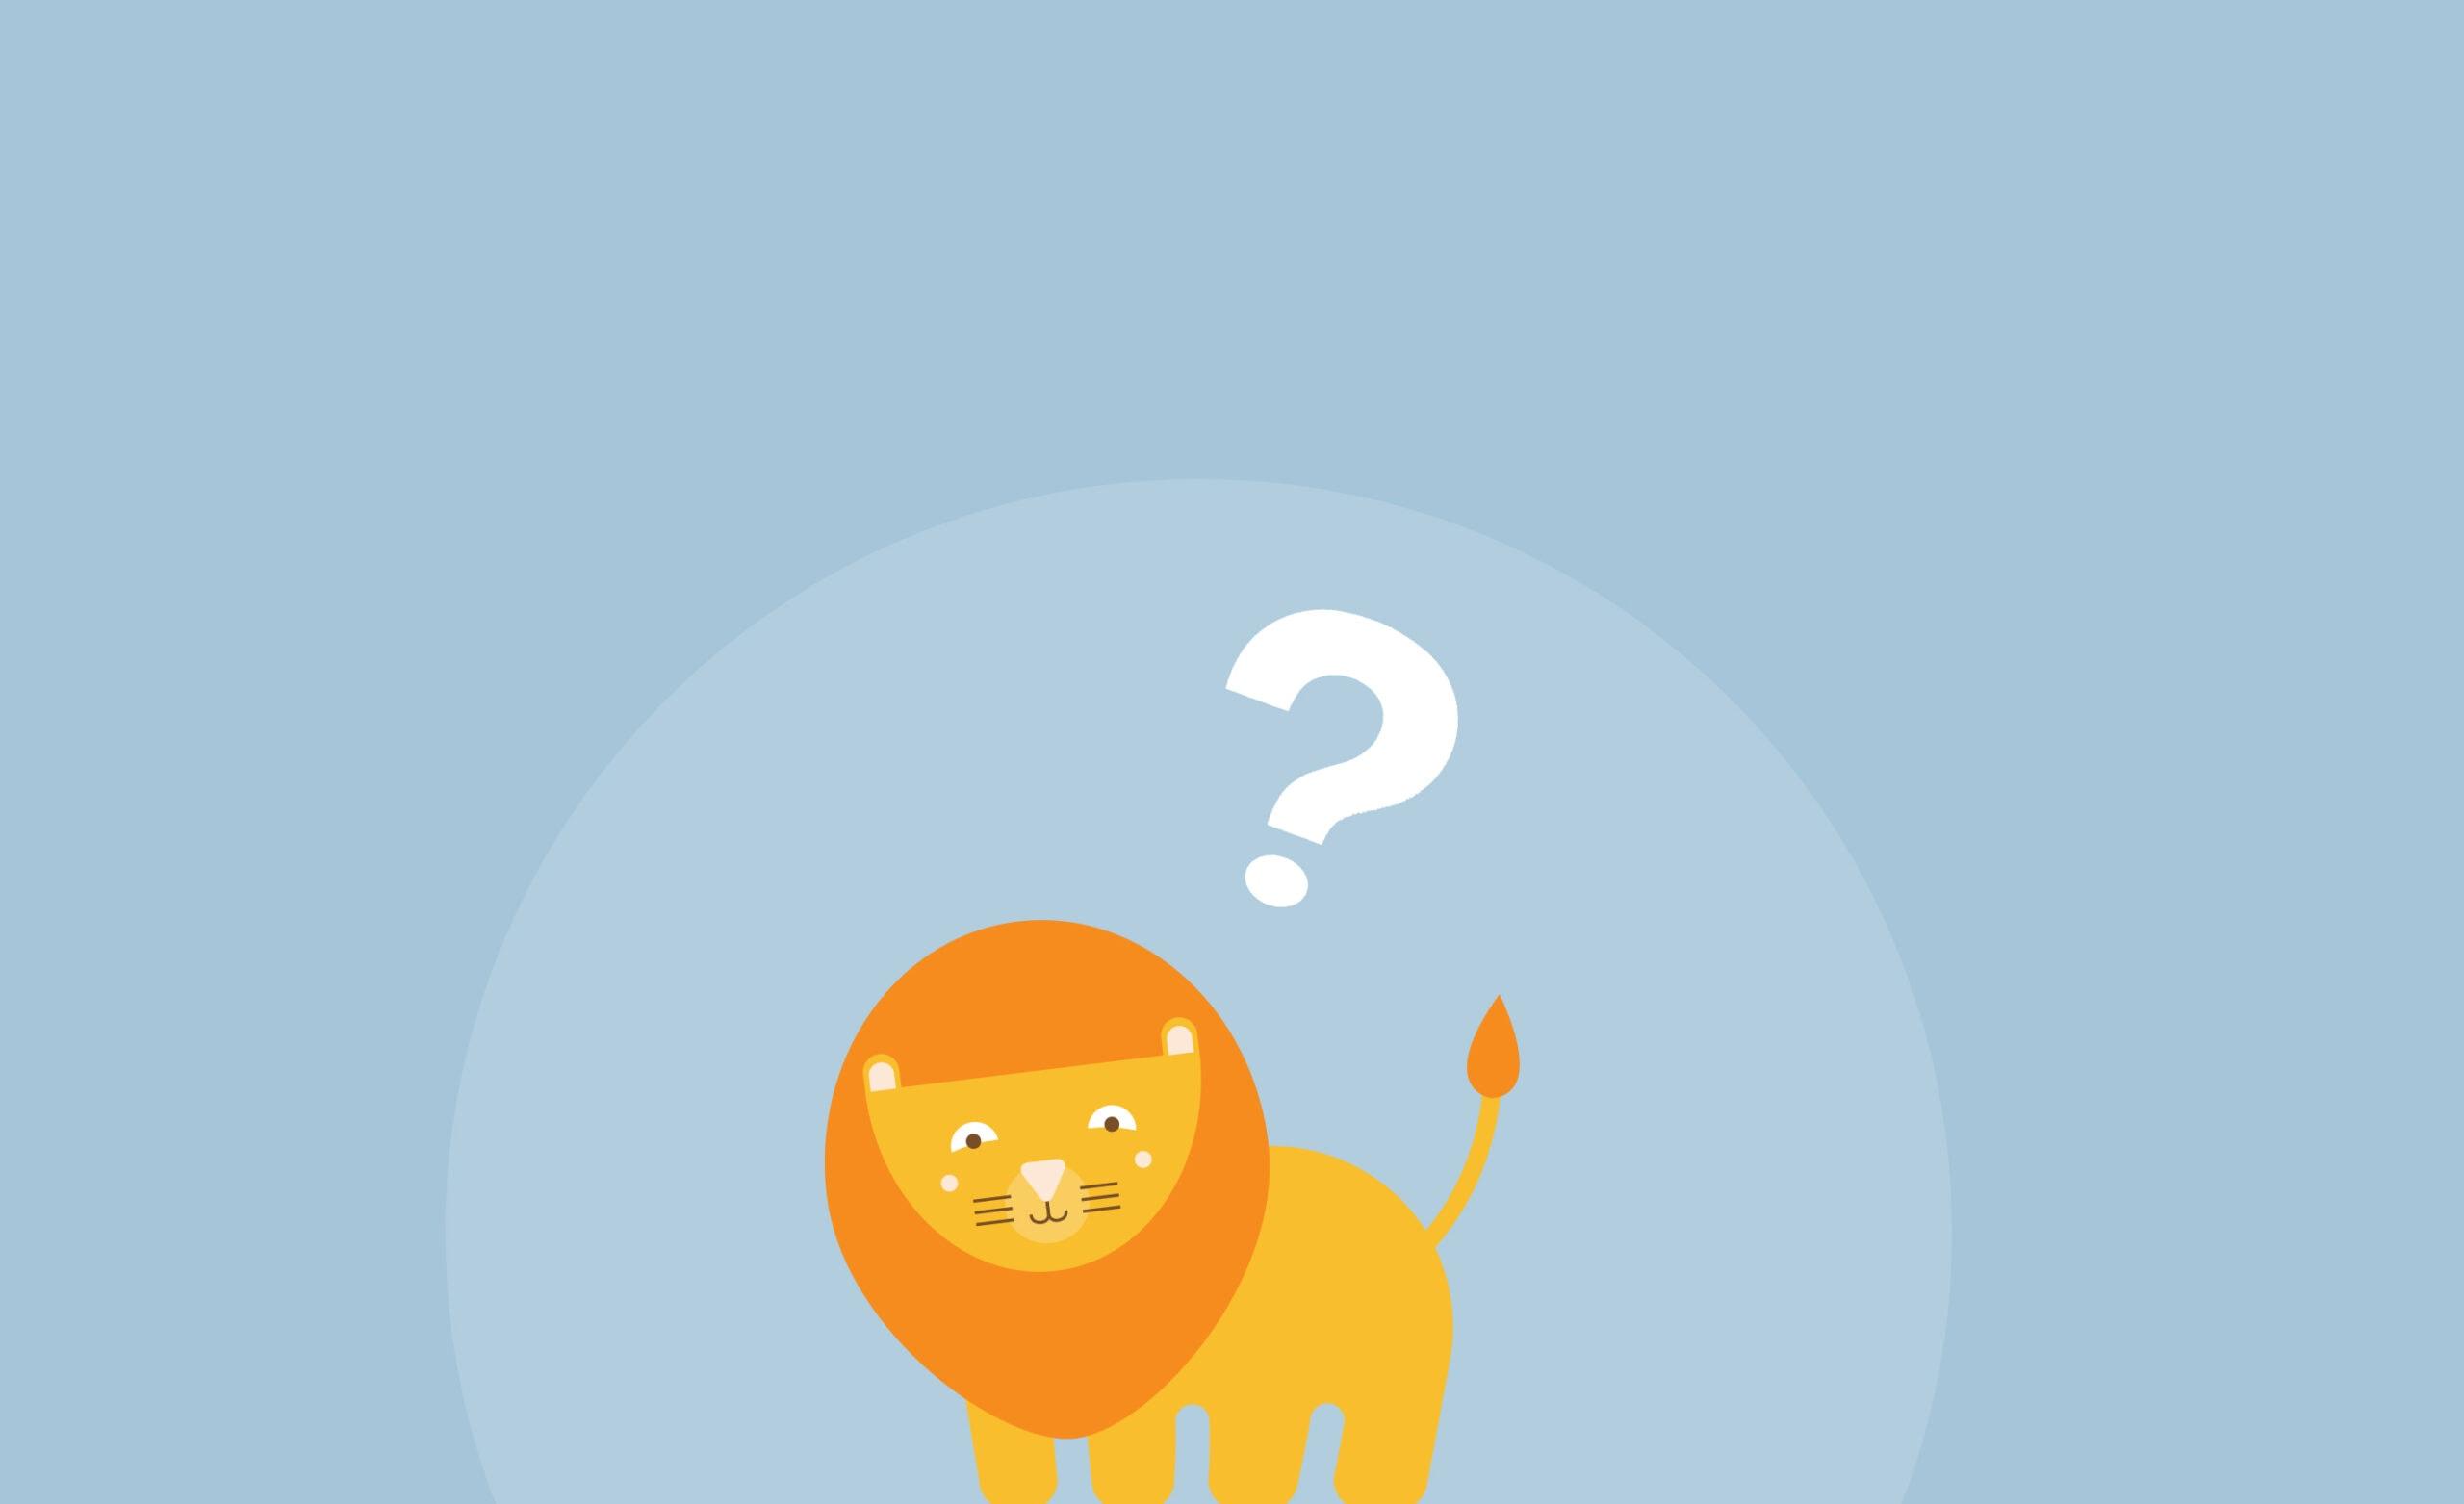 webbabyshower lion with question mark